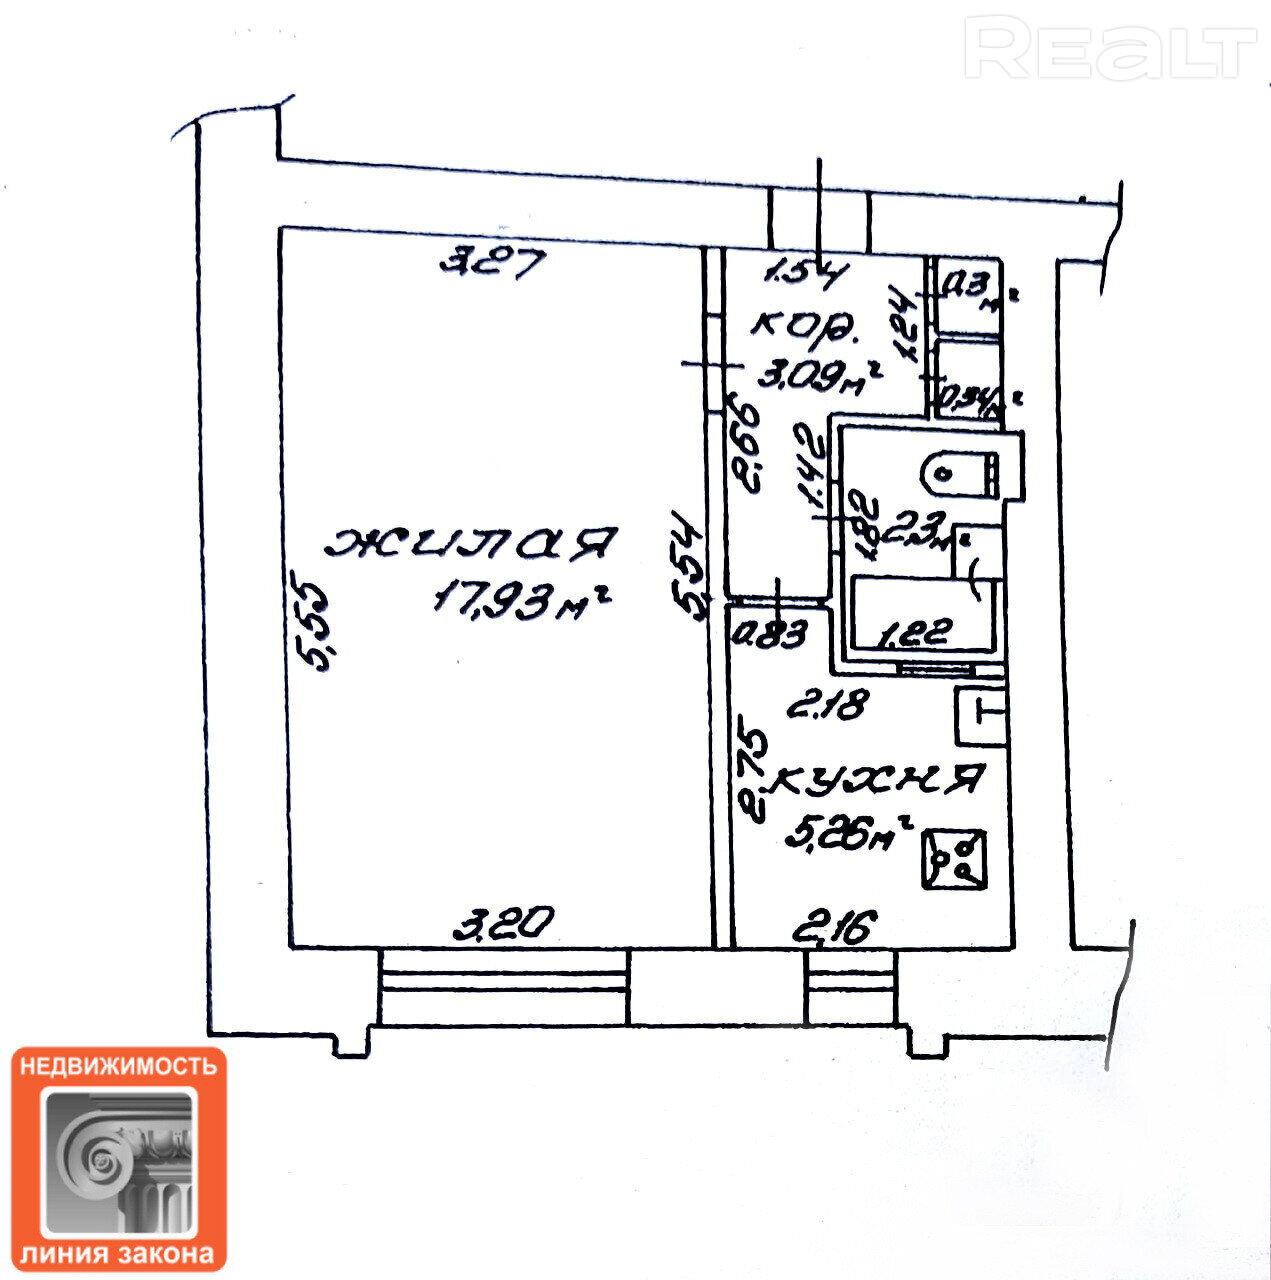 Продажа 1 комнатной квартиры в г. Гомеле, ул. Катунина, дом 16 (р-н Центр). Цена 40 445 руб